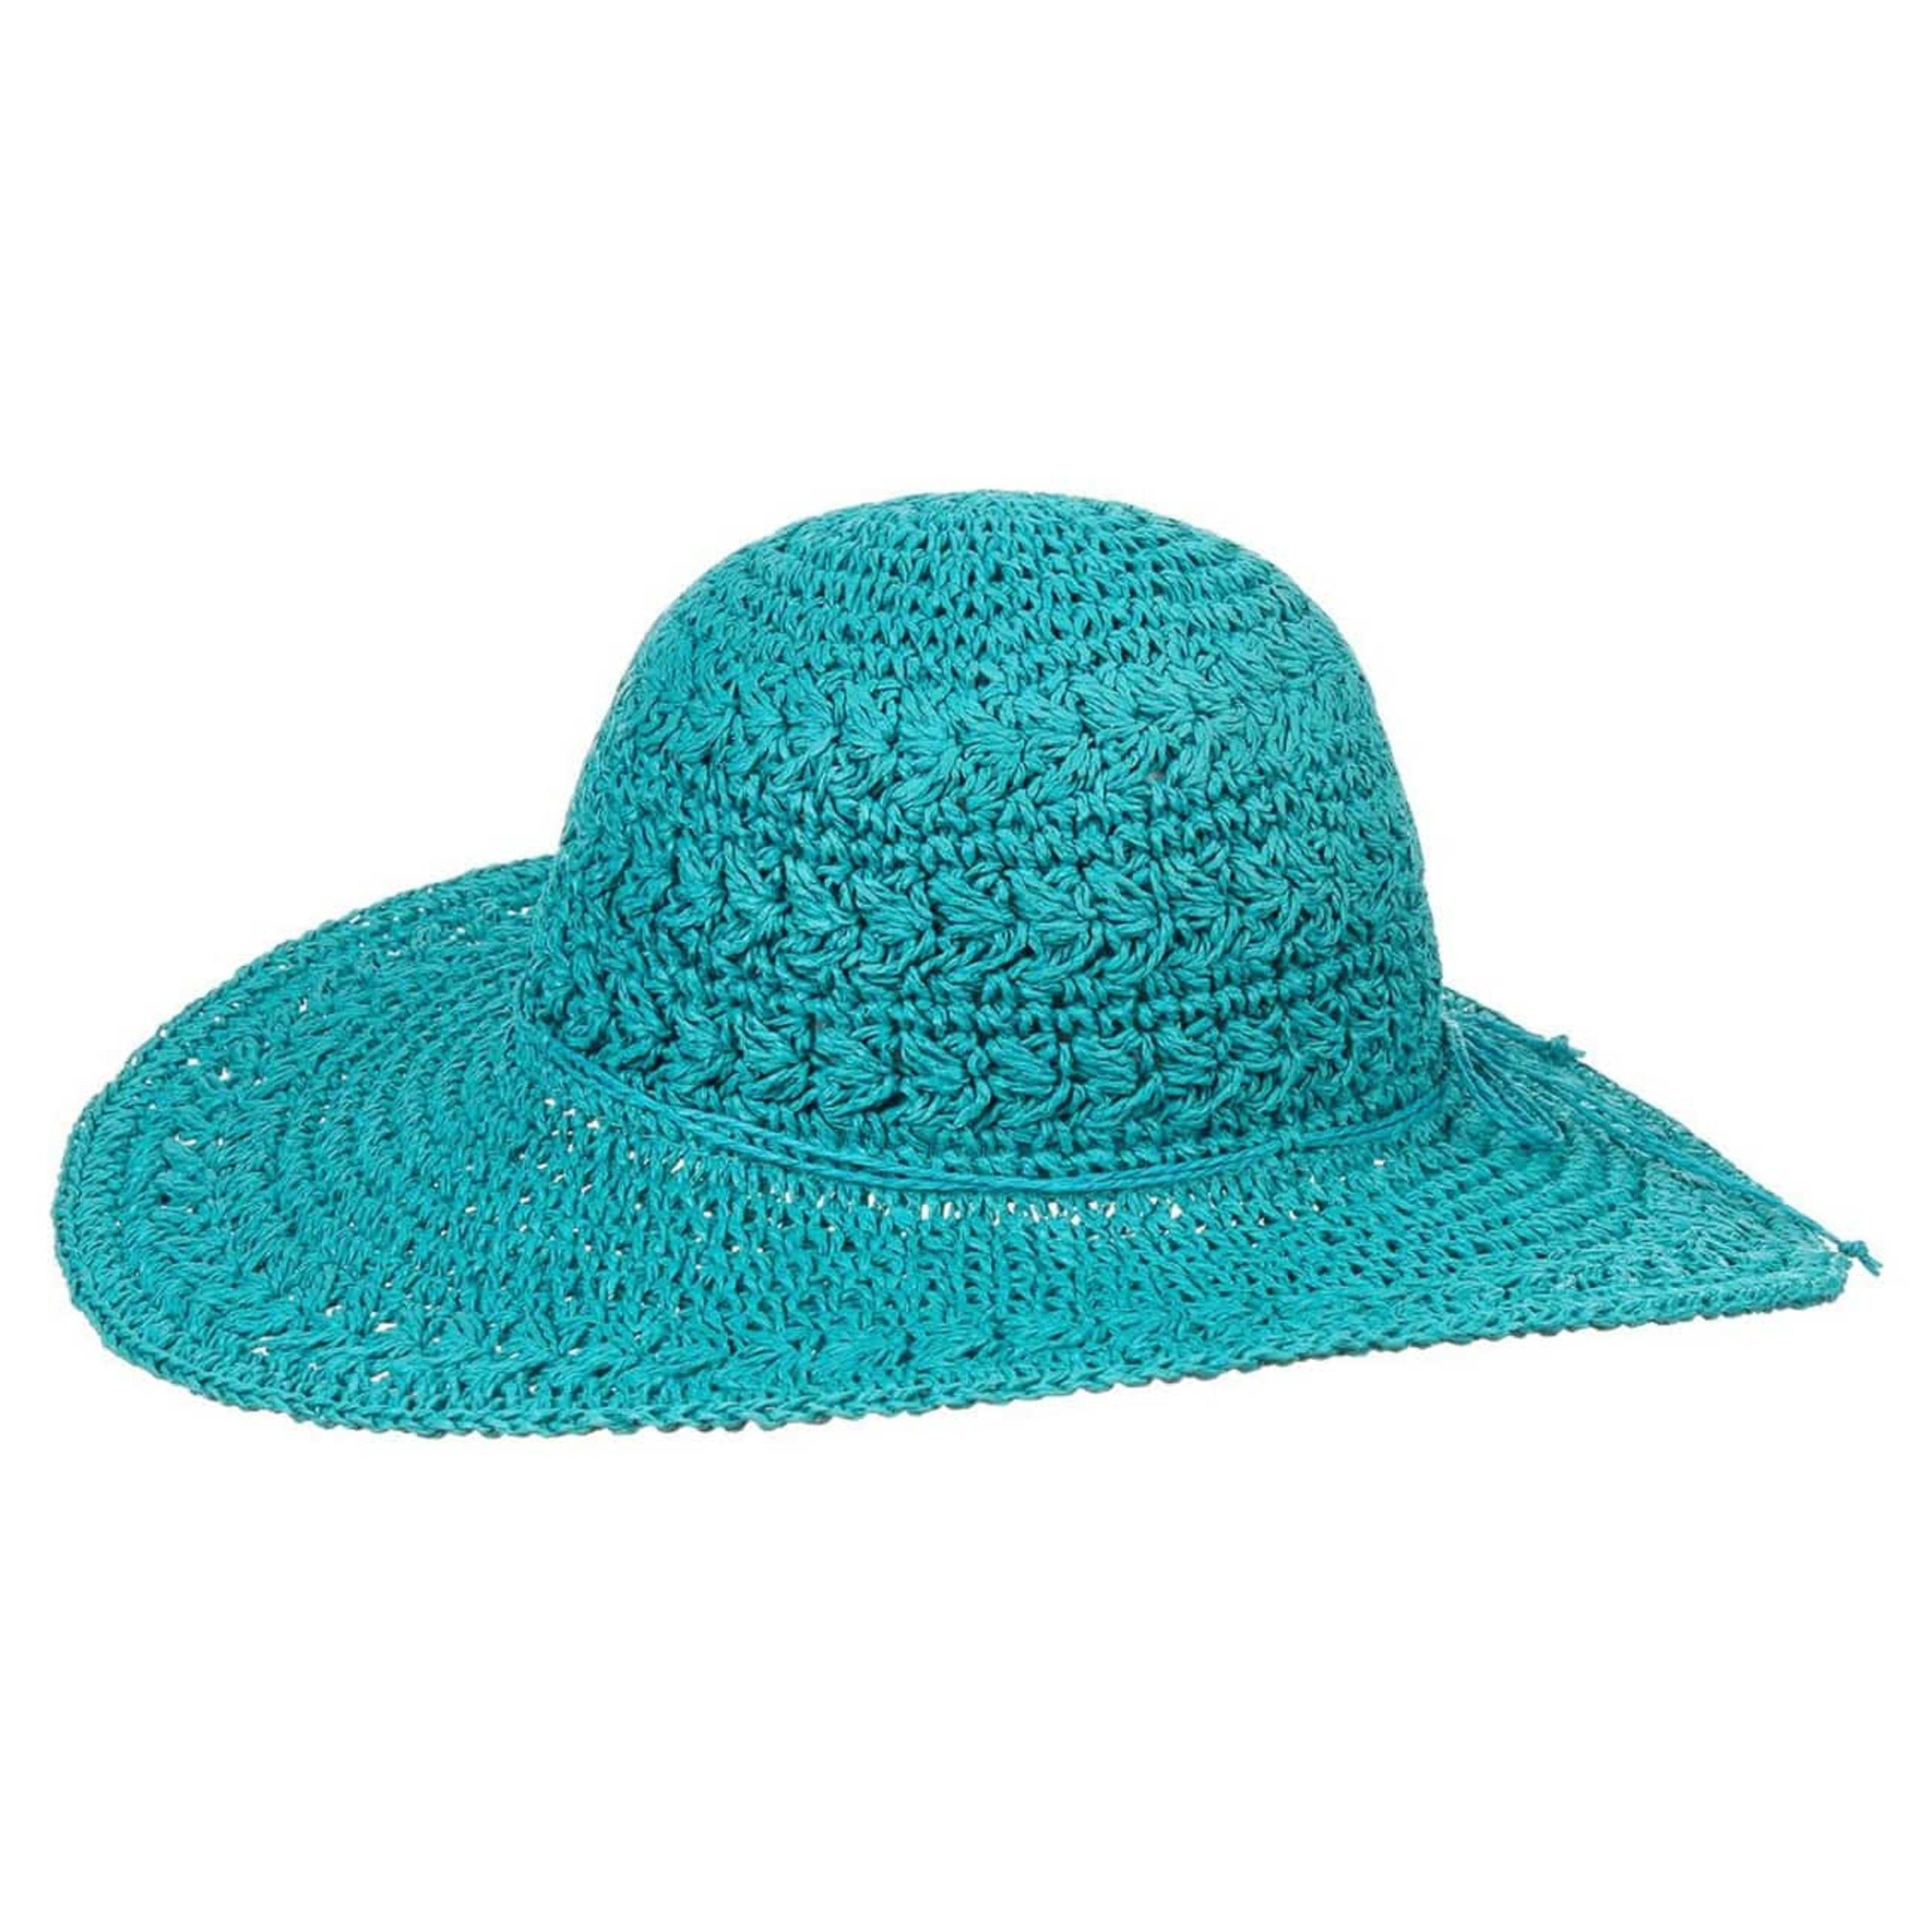 crochet 180 s straw hat 19 95